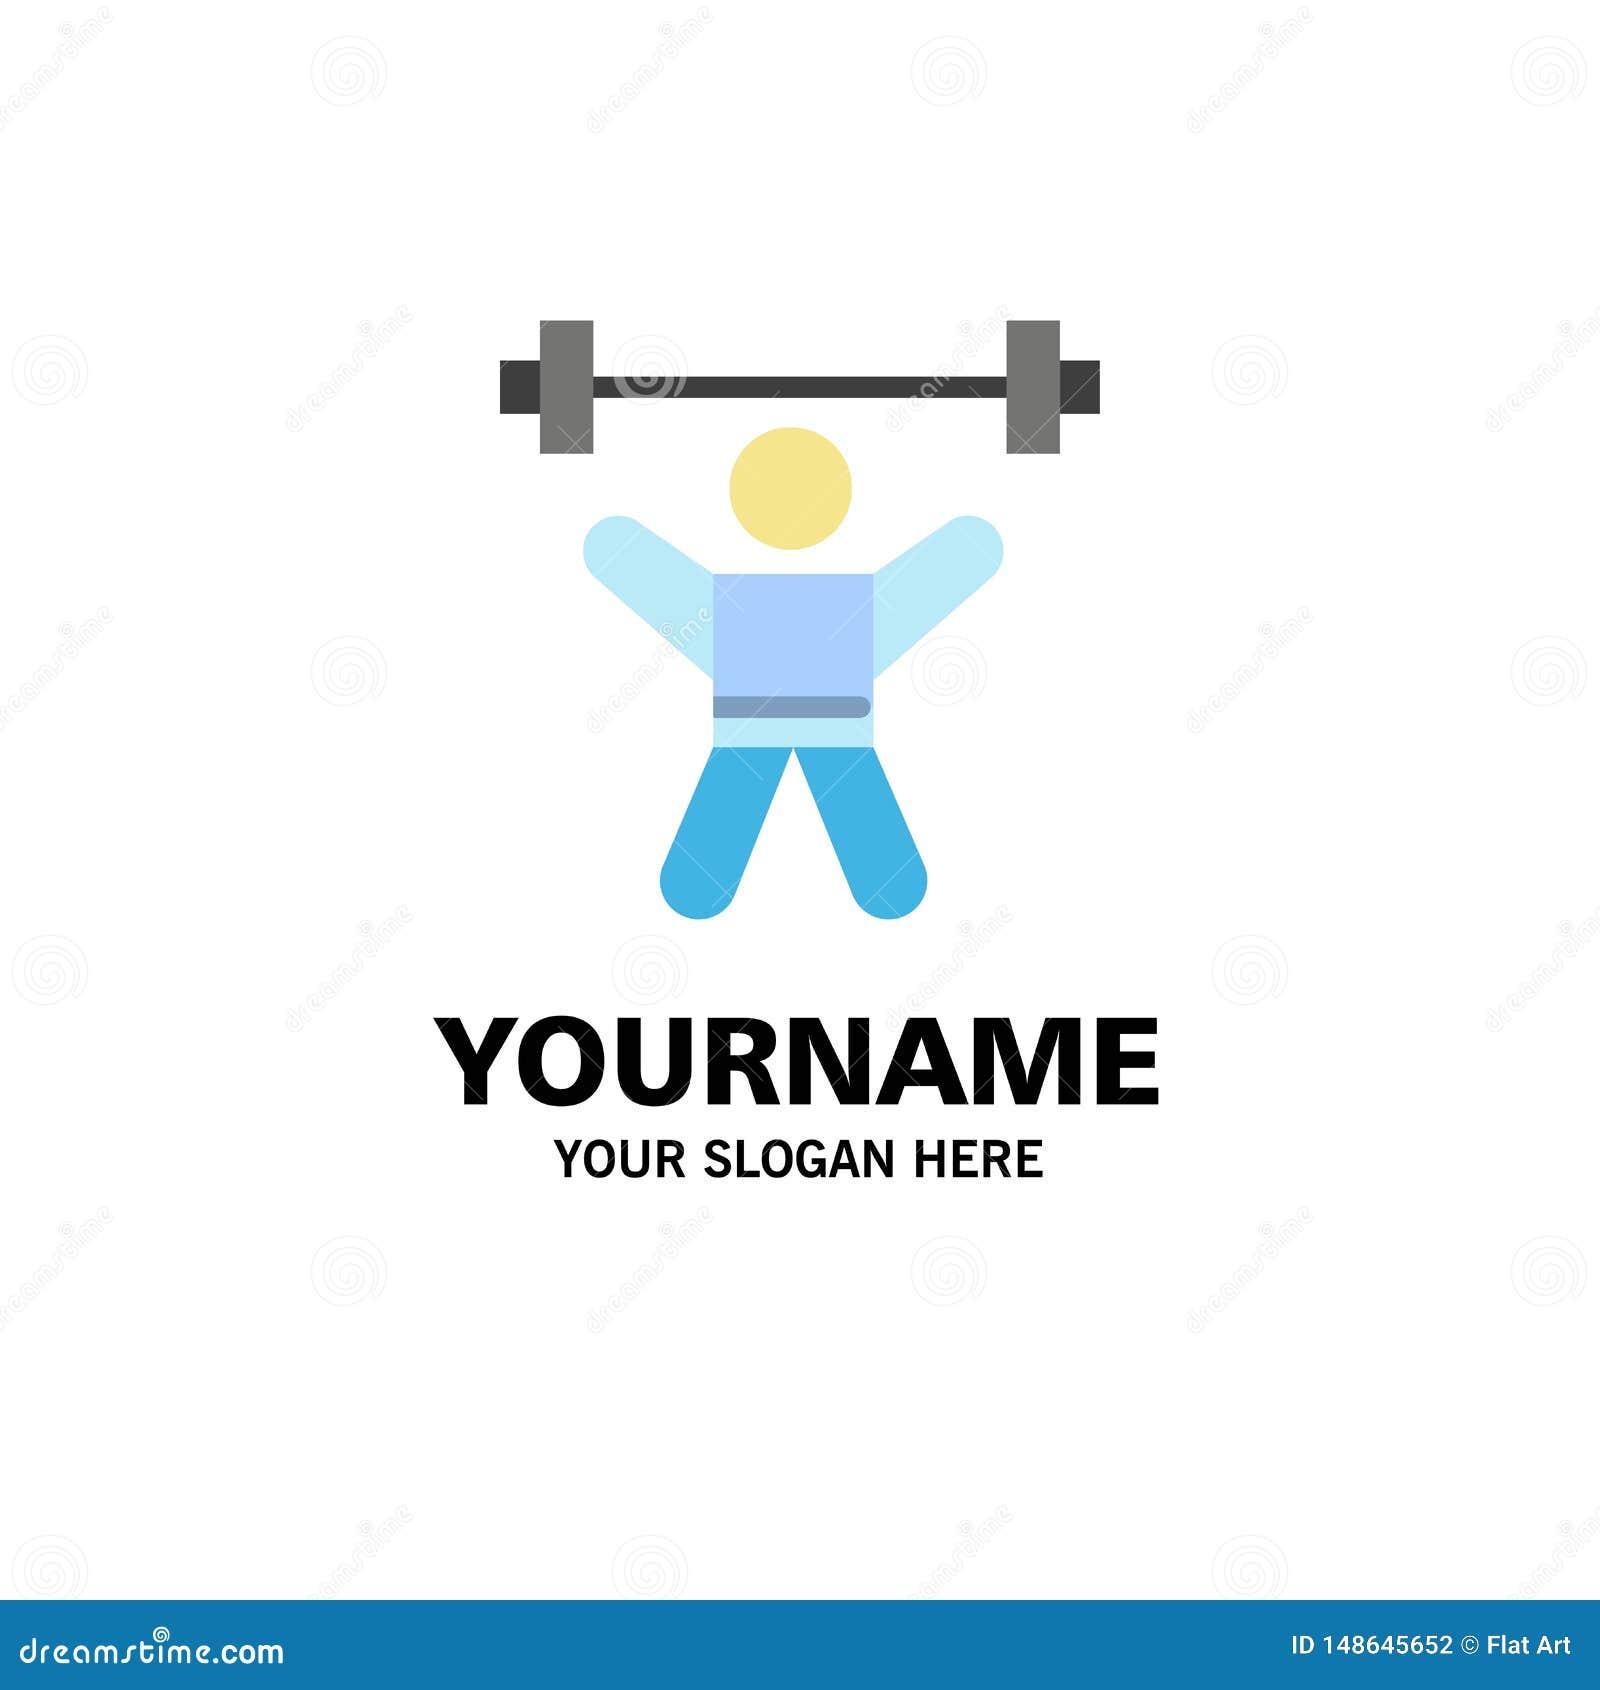 Athlete, Athletics, Avatar, Fitness, Gym Business Logo Template. Flat Color